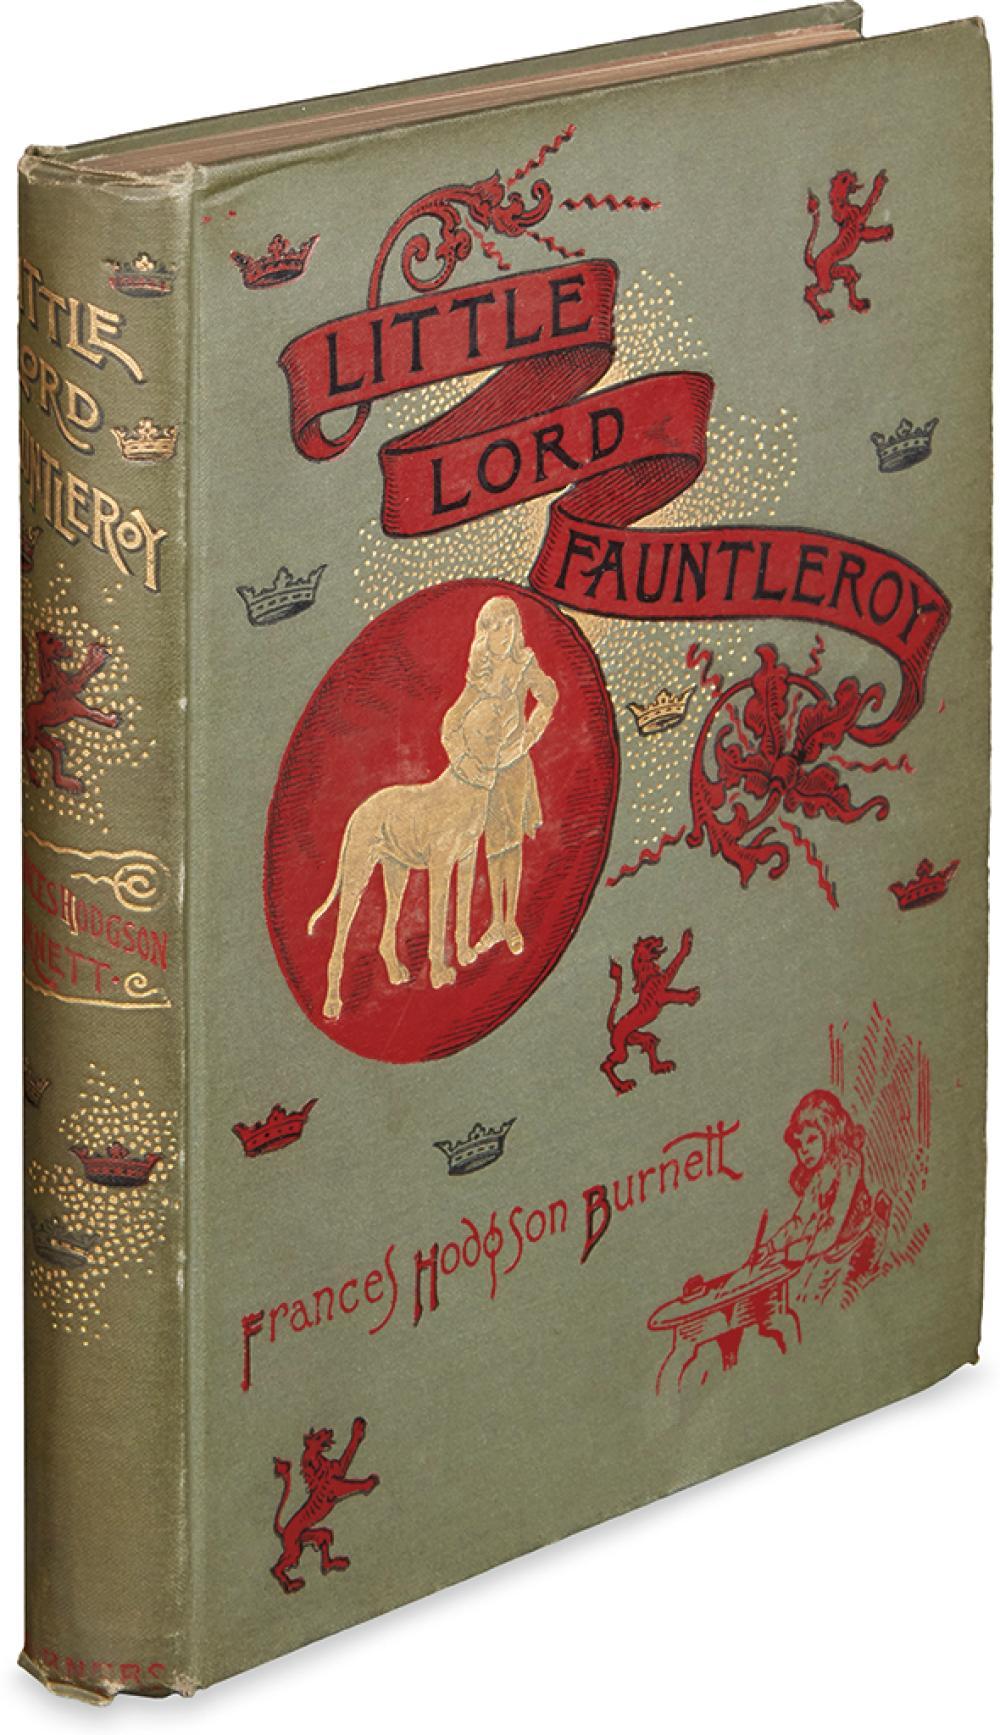 (CHILDREN'S LITERATURE.) BURNETT, FRANCES HODGSON. Little Lord Fauntleroy.